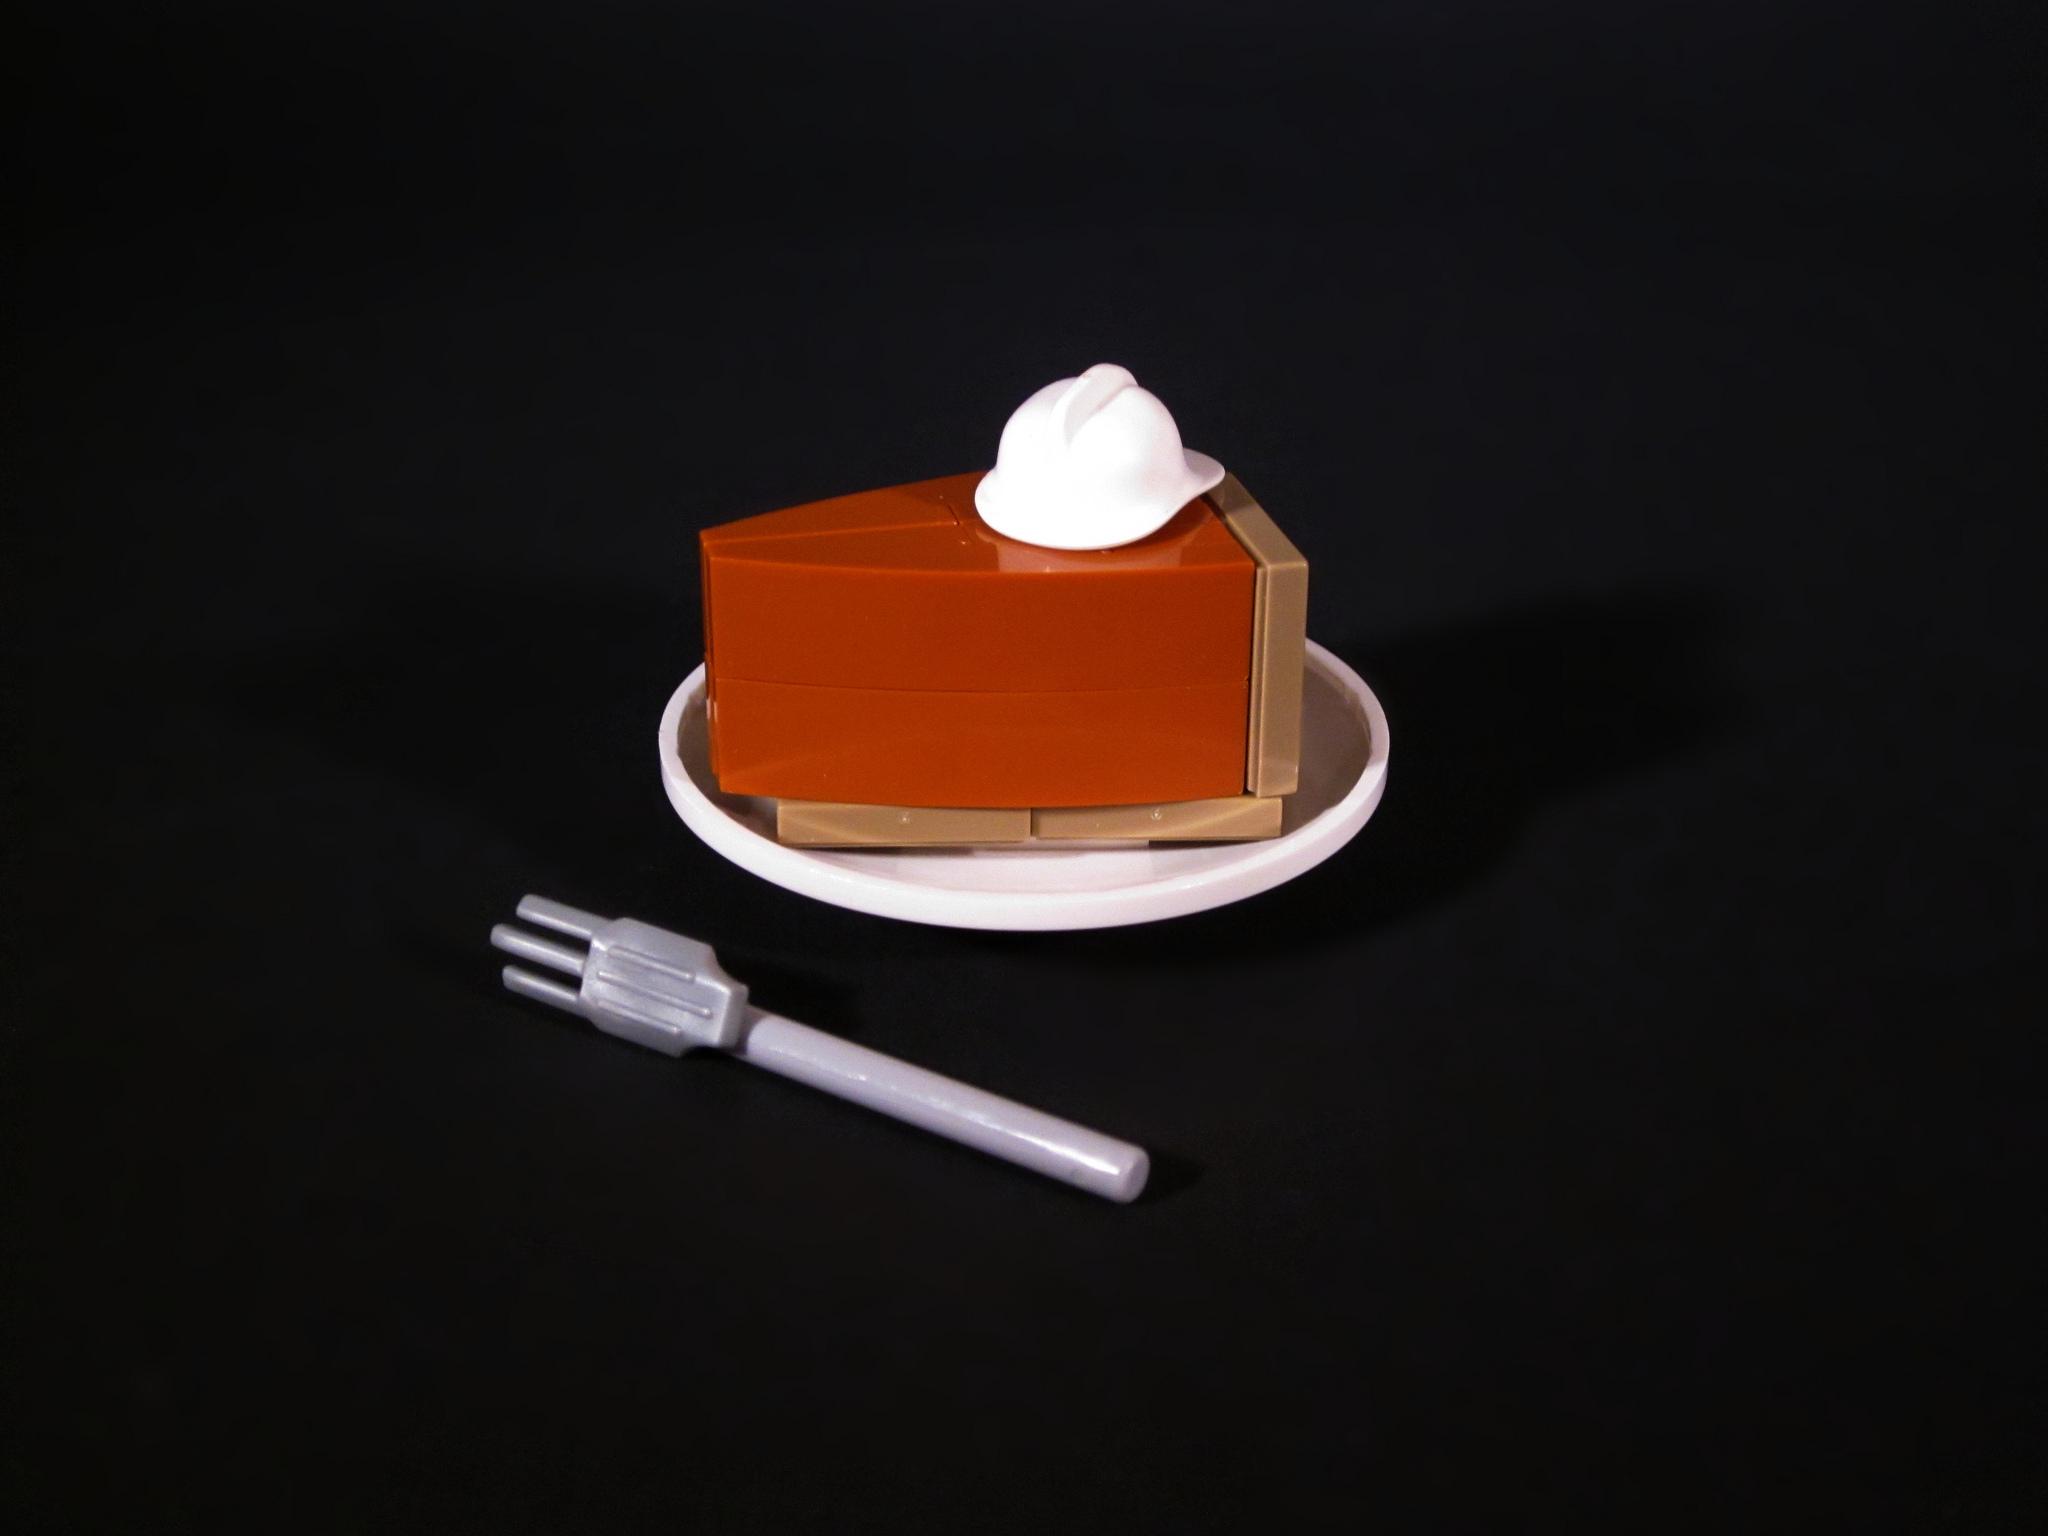 foodcember - lego balkabaklı cheesecake